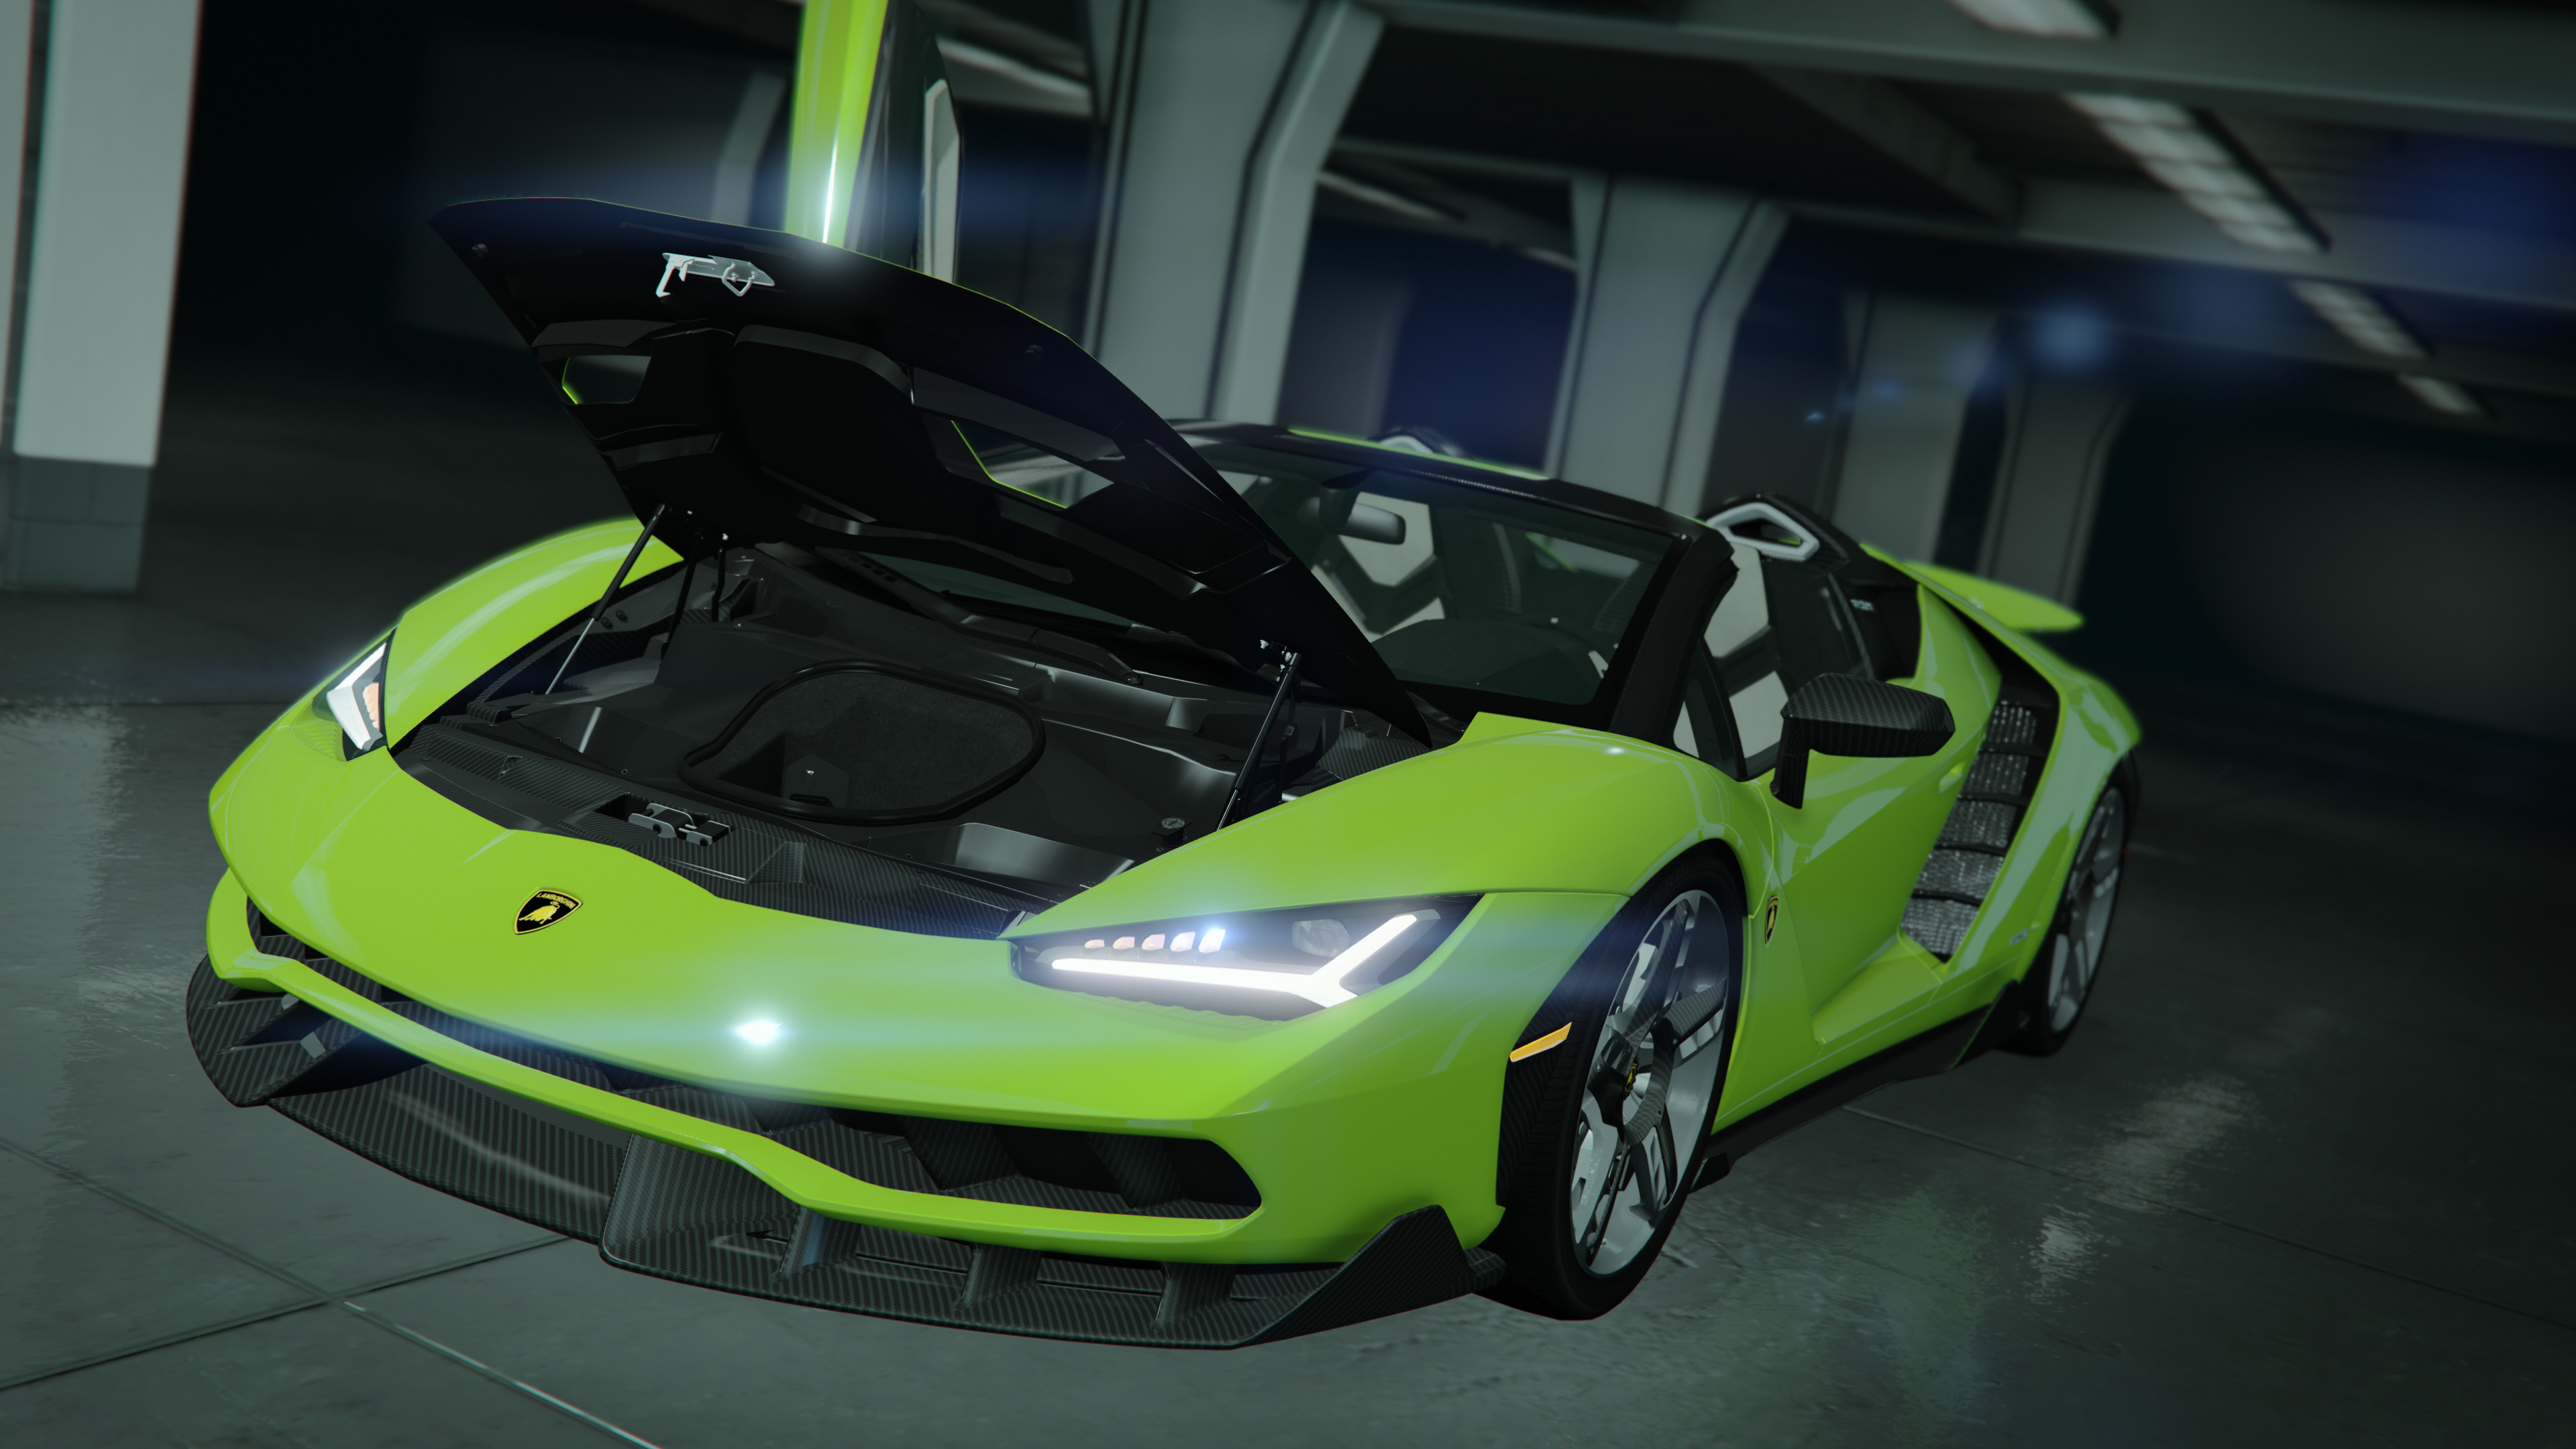 Lamborghini Centenario Roadster Lp 770 4 Remastered Gta5 Mods Com